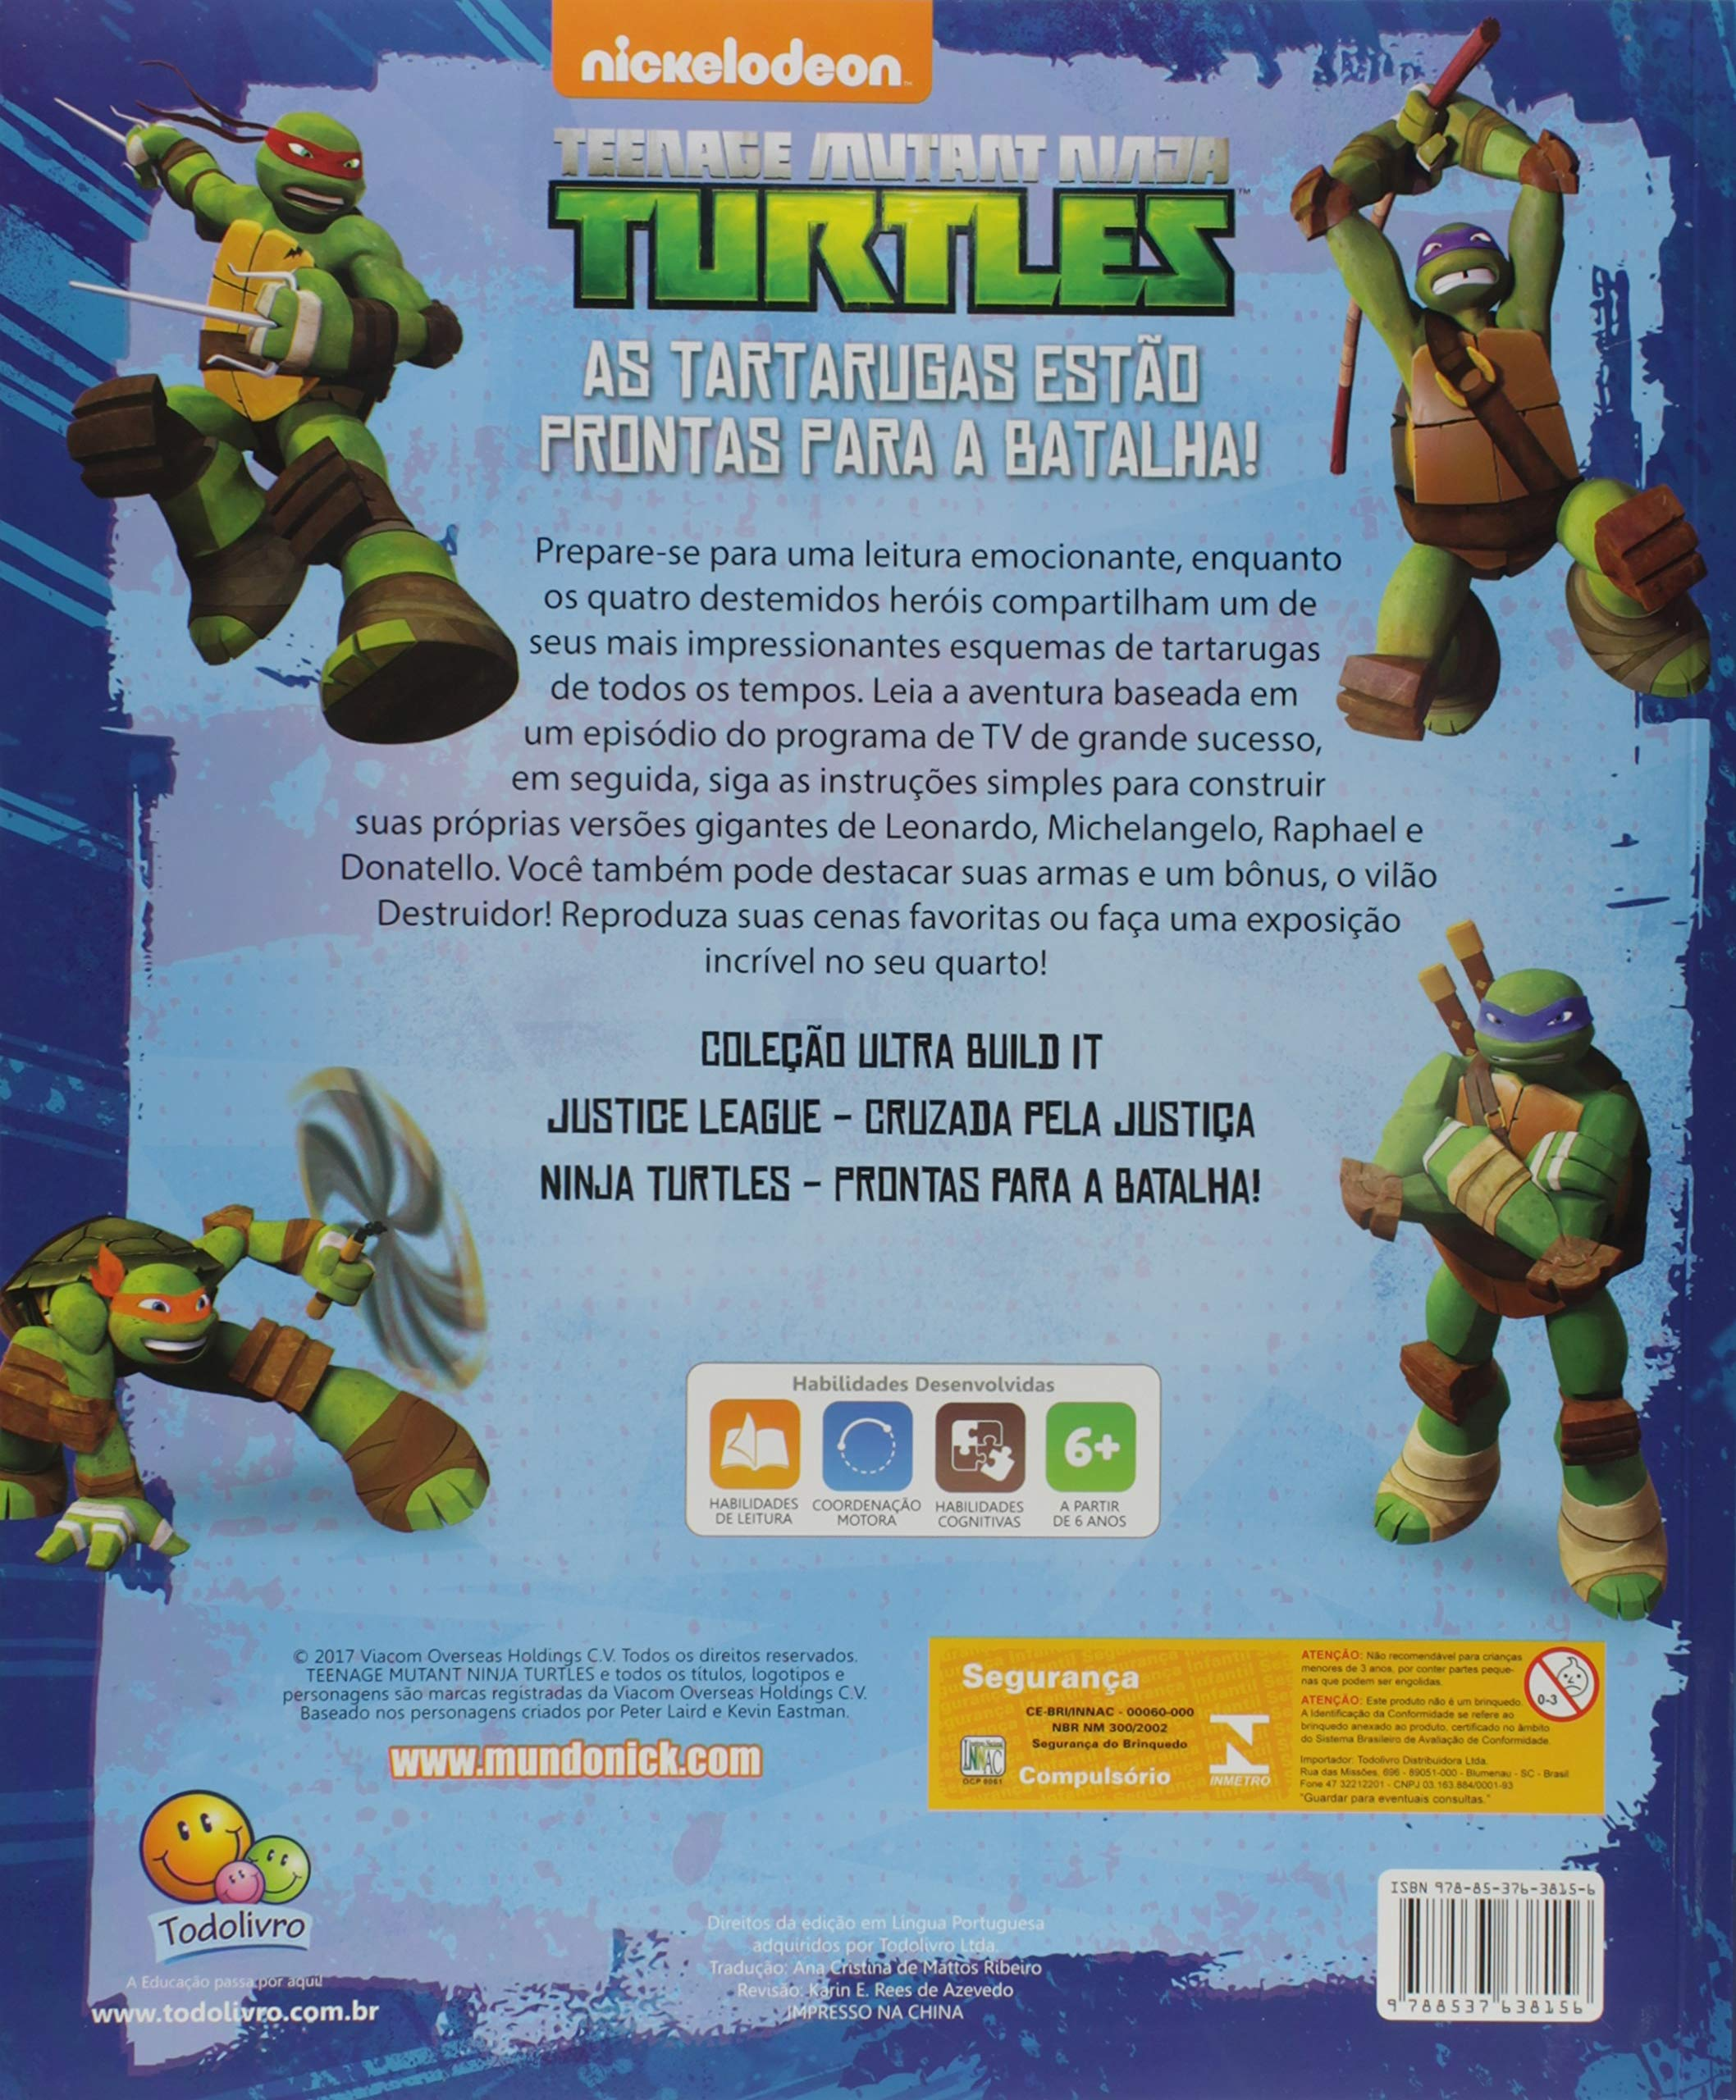 Ultra build it: Ninja turtles - Prontas para a batalha ...